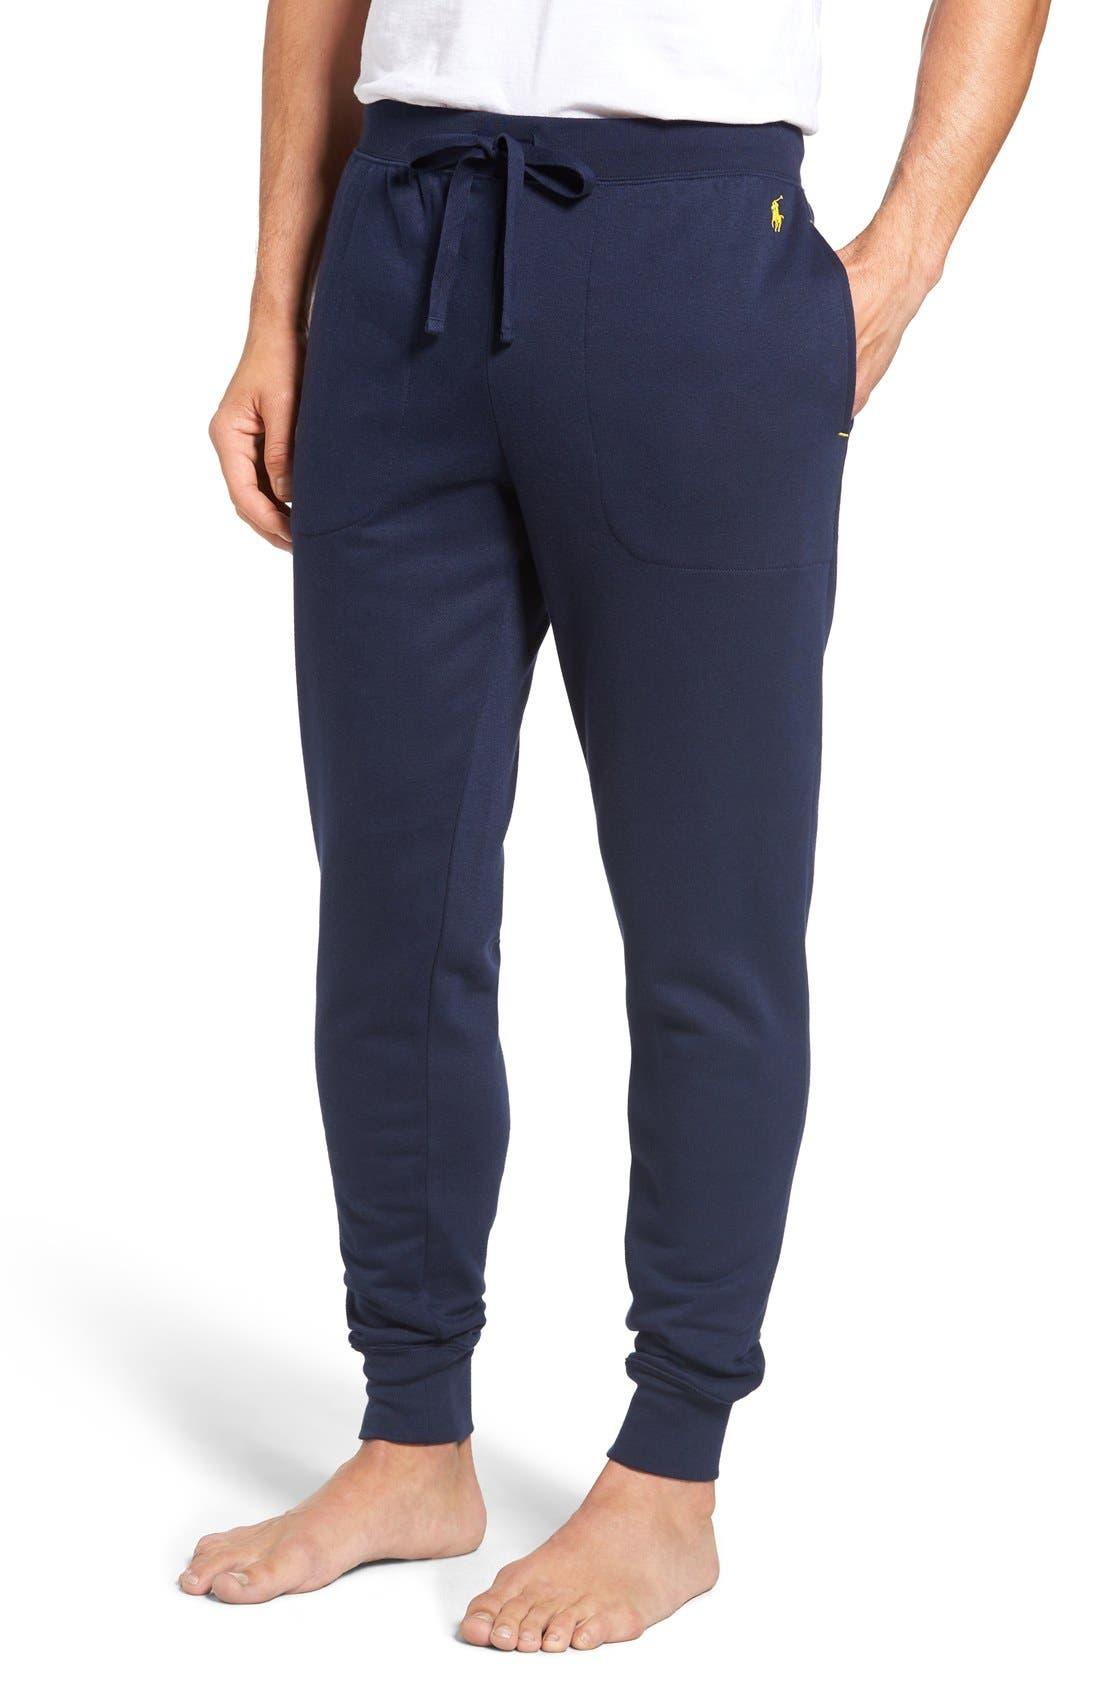 Main Image - Polo Ralph Lauren Brushed Jersey Cotton Blend Jogger Pants